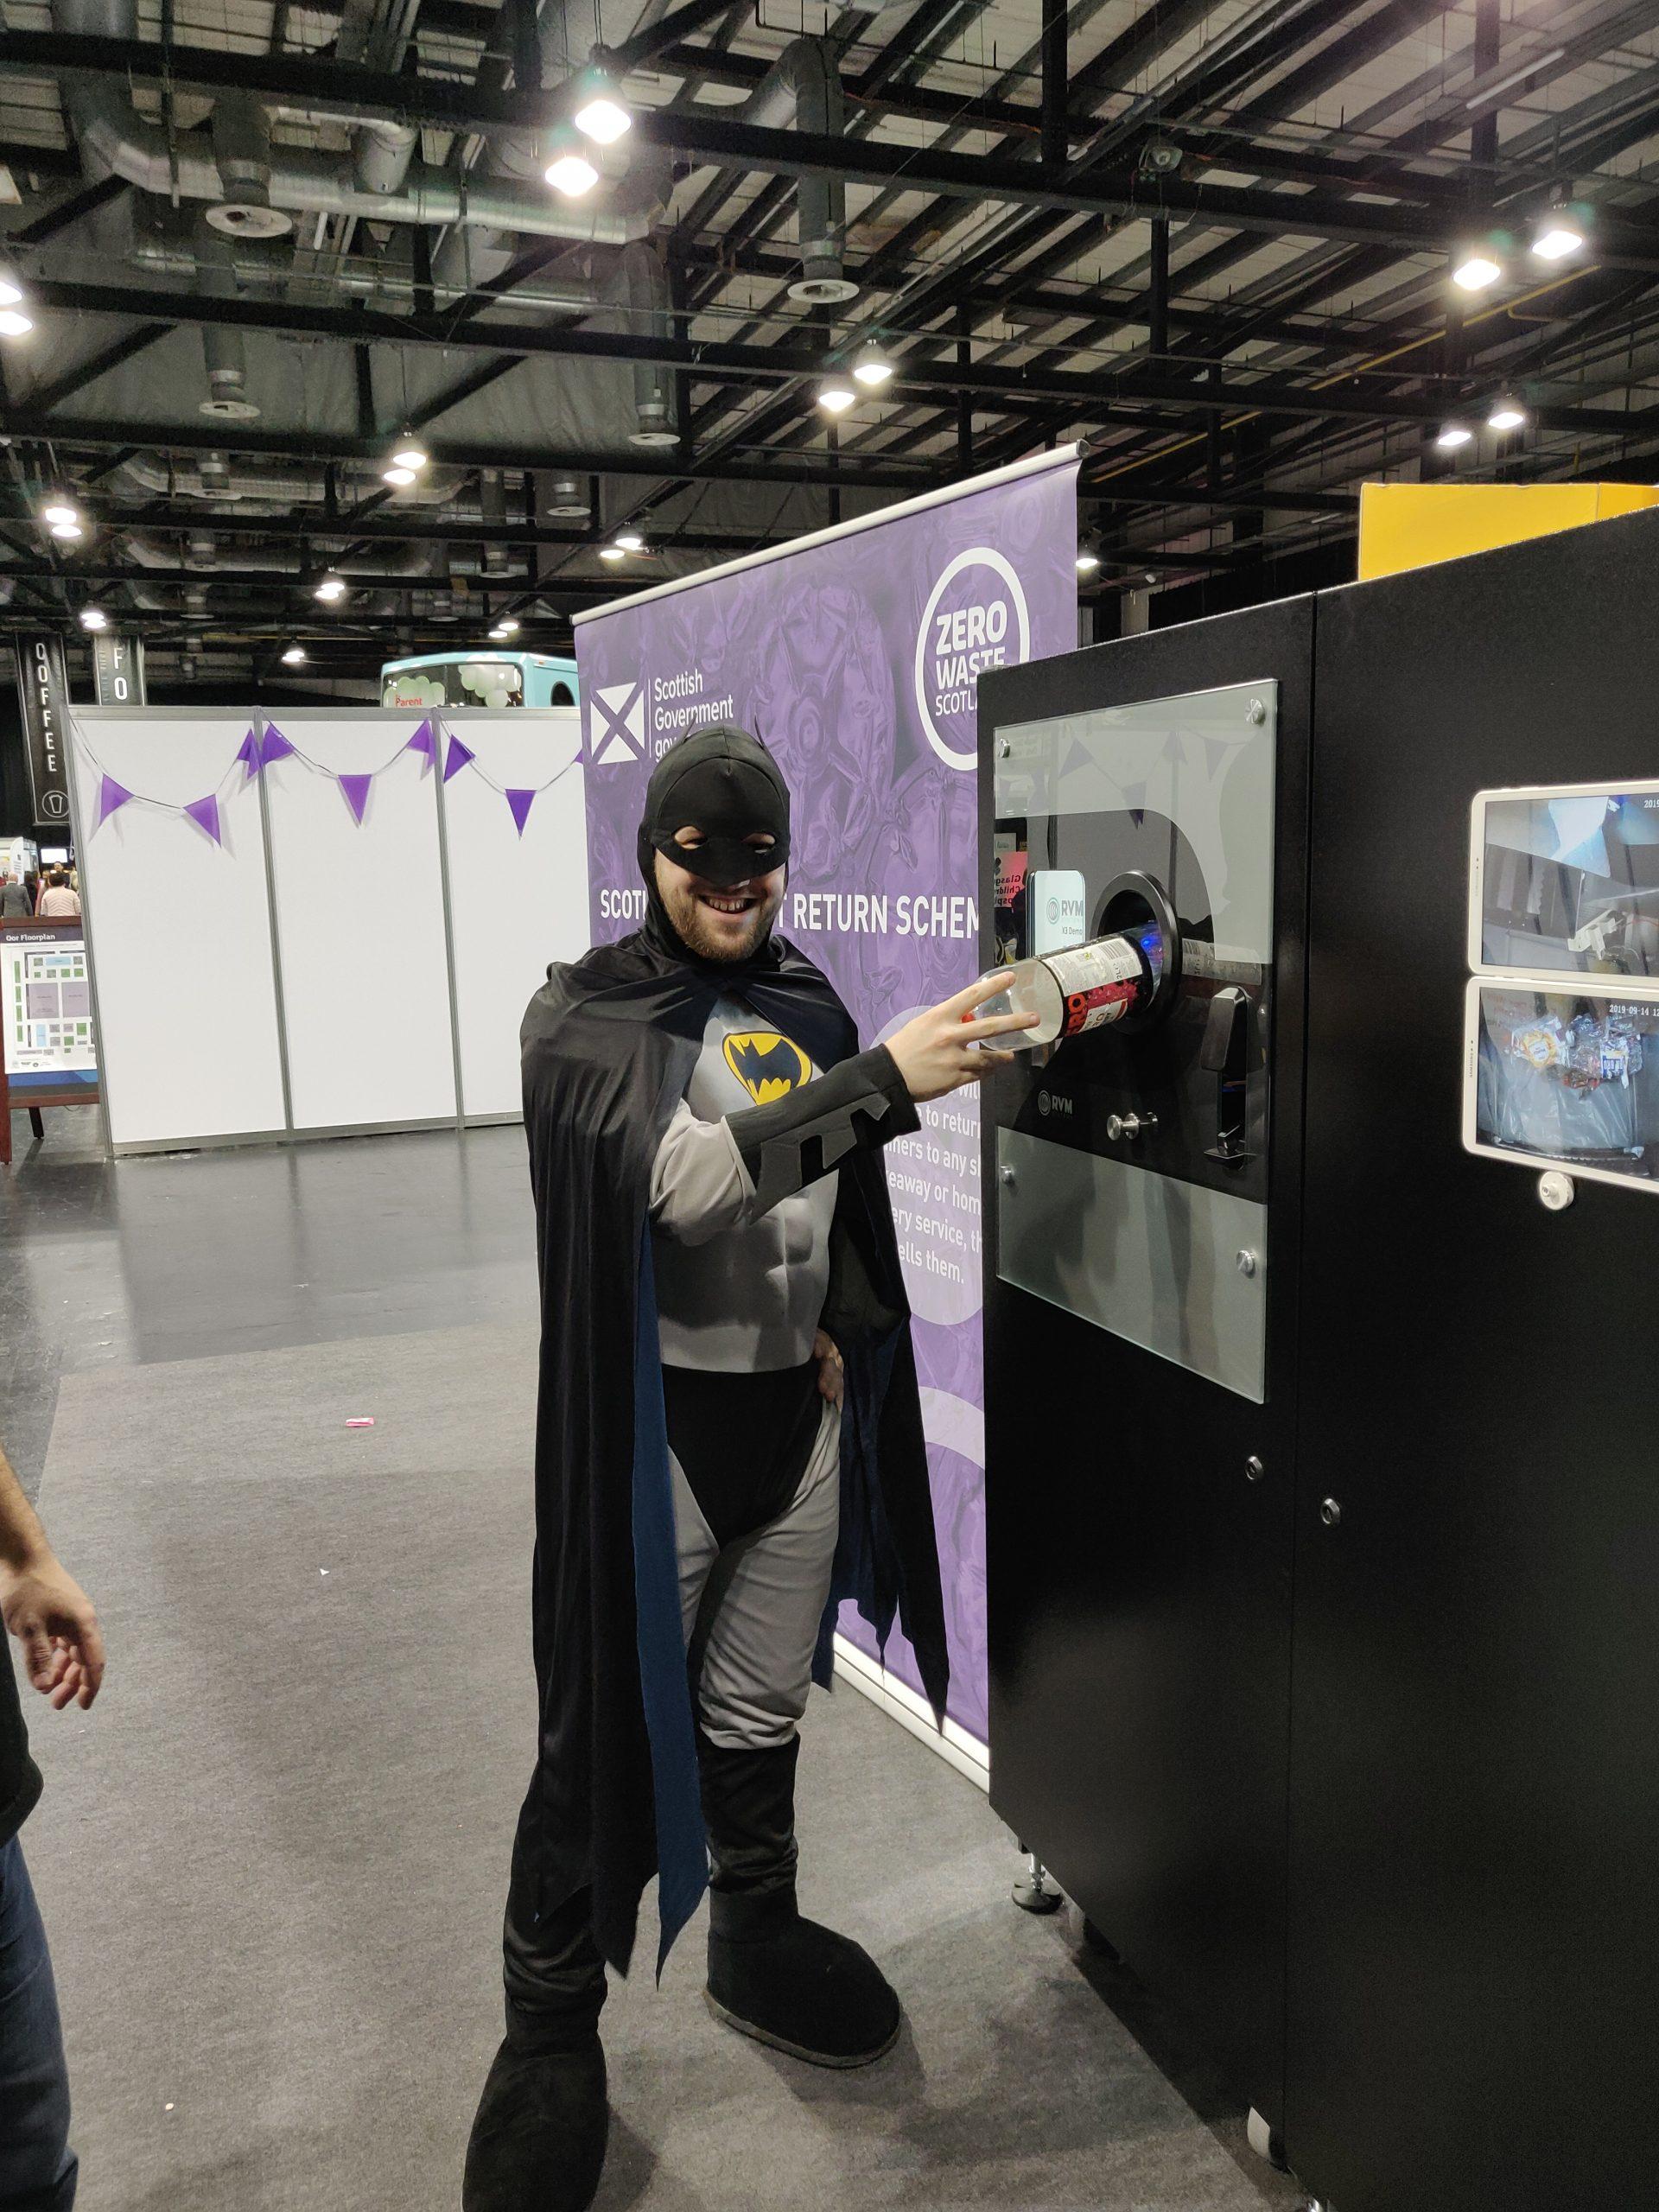 Batman using the Reverse Vending at Zero Waste Scotland Stand